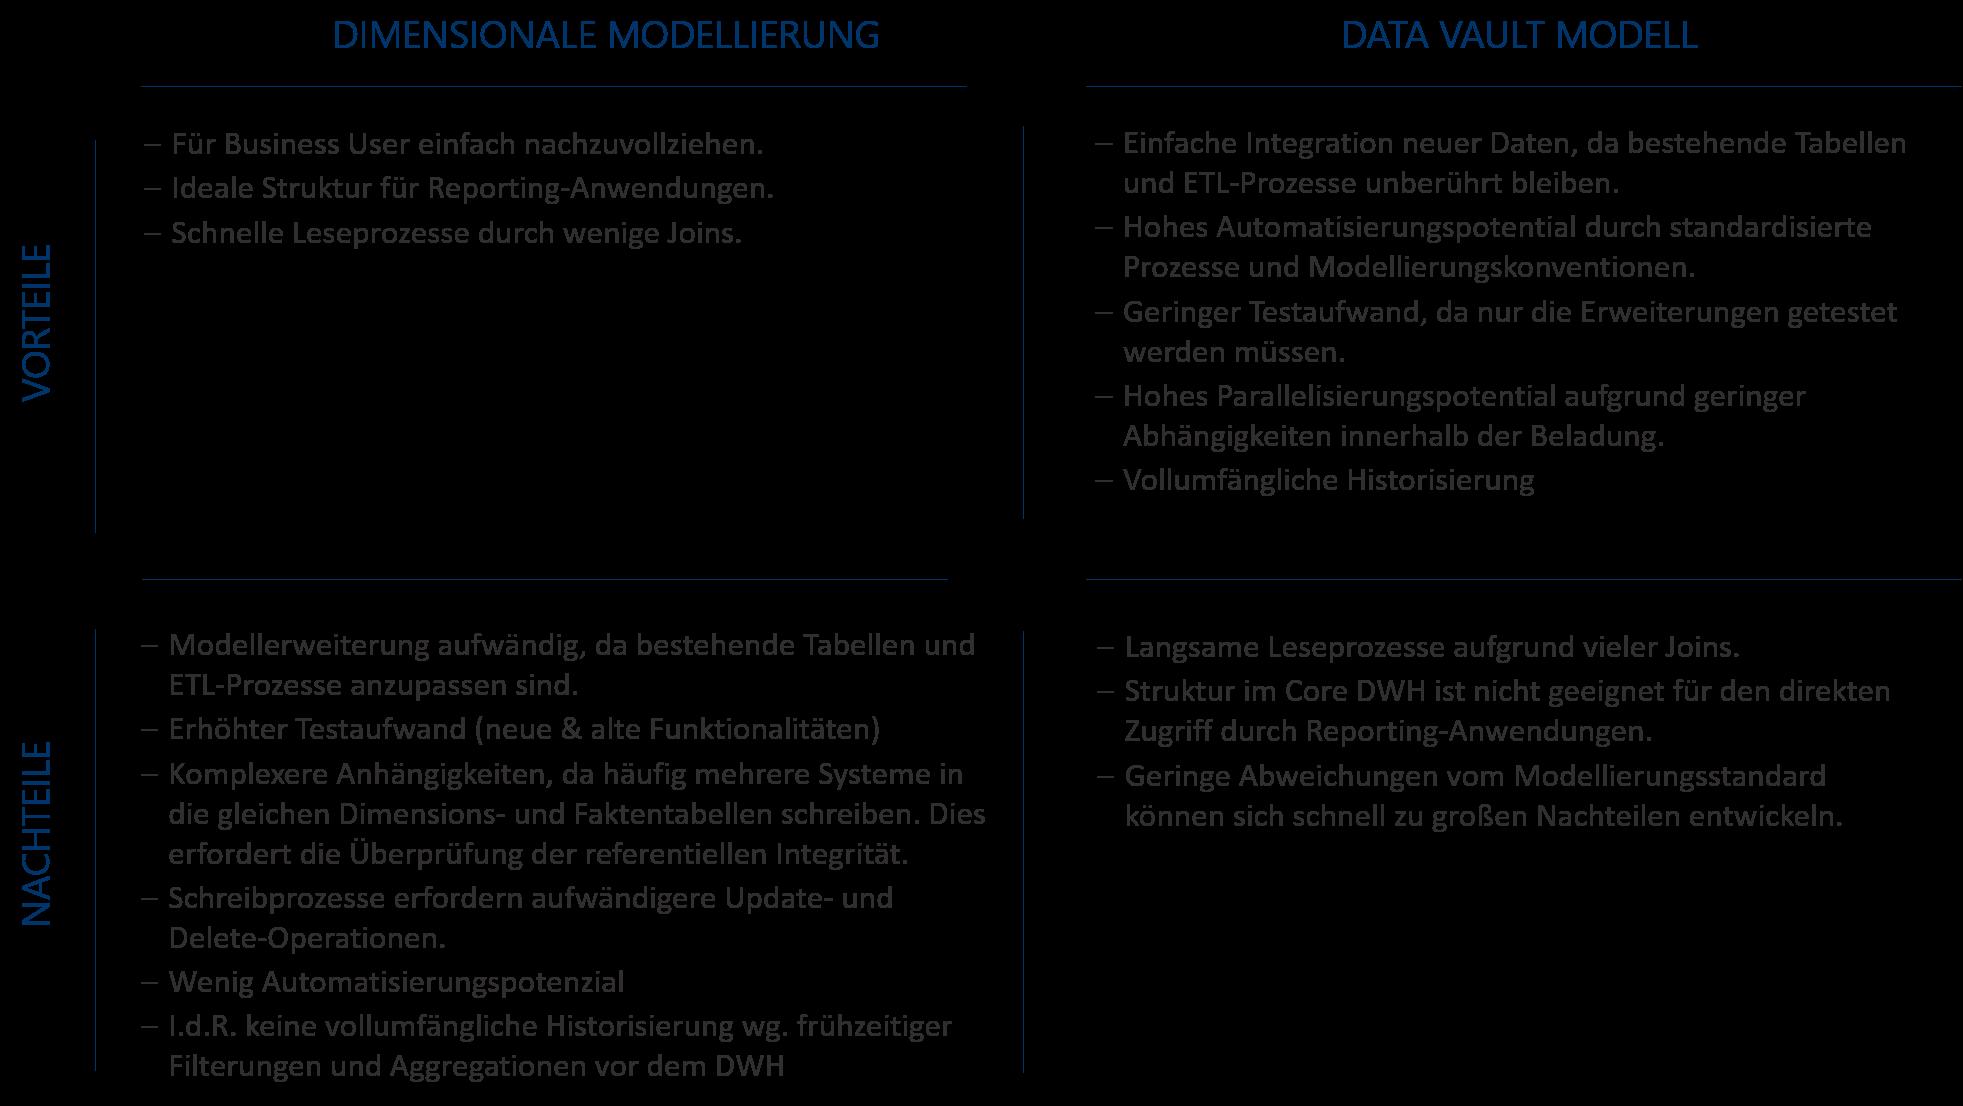 Abbildung 9: Dimensionale Modellierung vs. Data Vault Modell